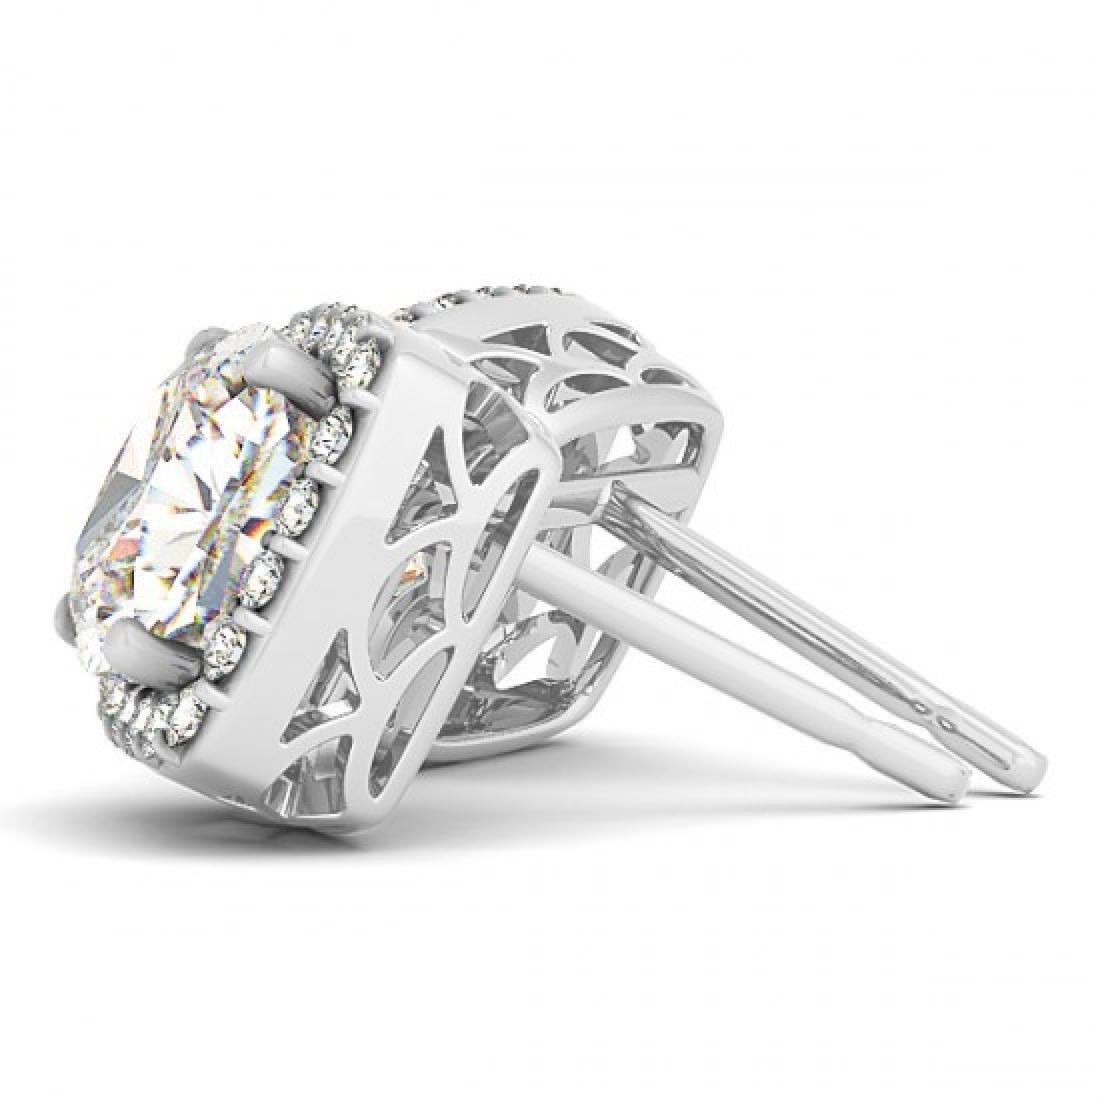 3 CTW Diamond VS/SI Certified Cushion Cut Earrings 14K